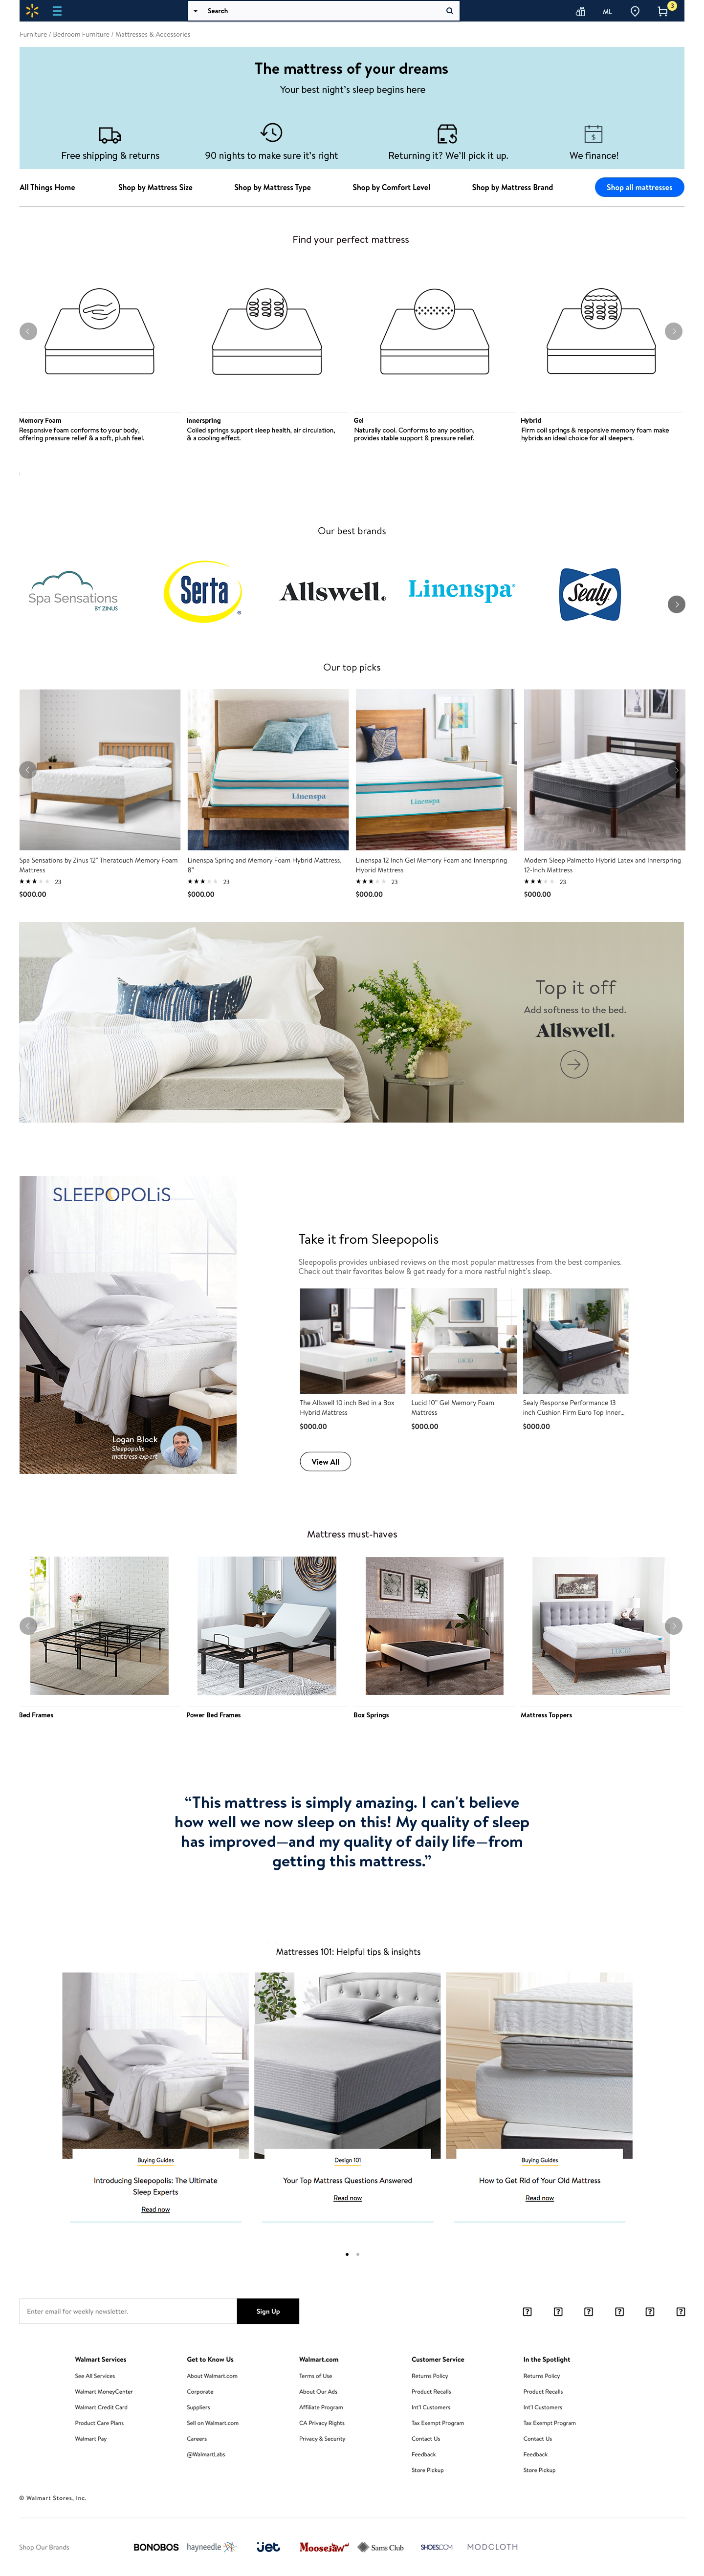 46365-314379_Home_Mattress_Experience_Mockup.jpg